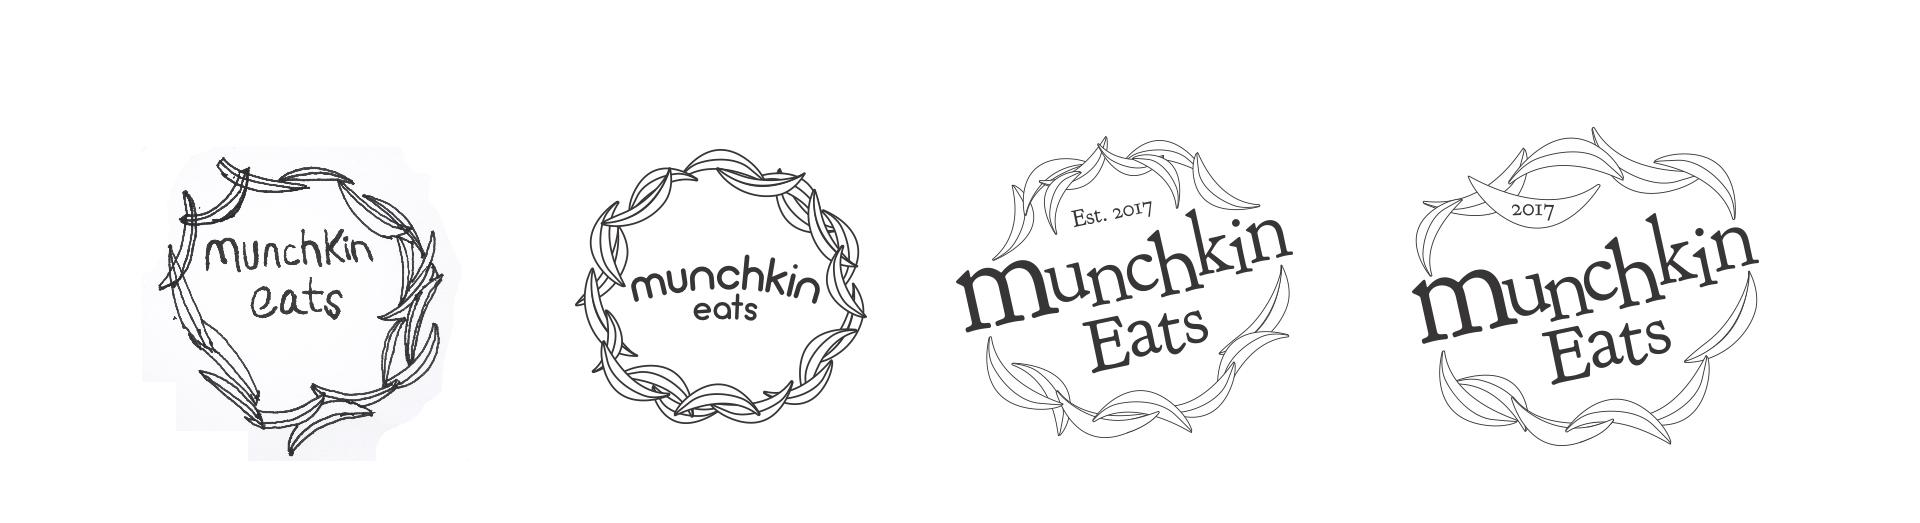 Munchkin Eats.008.jpeg